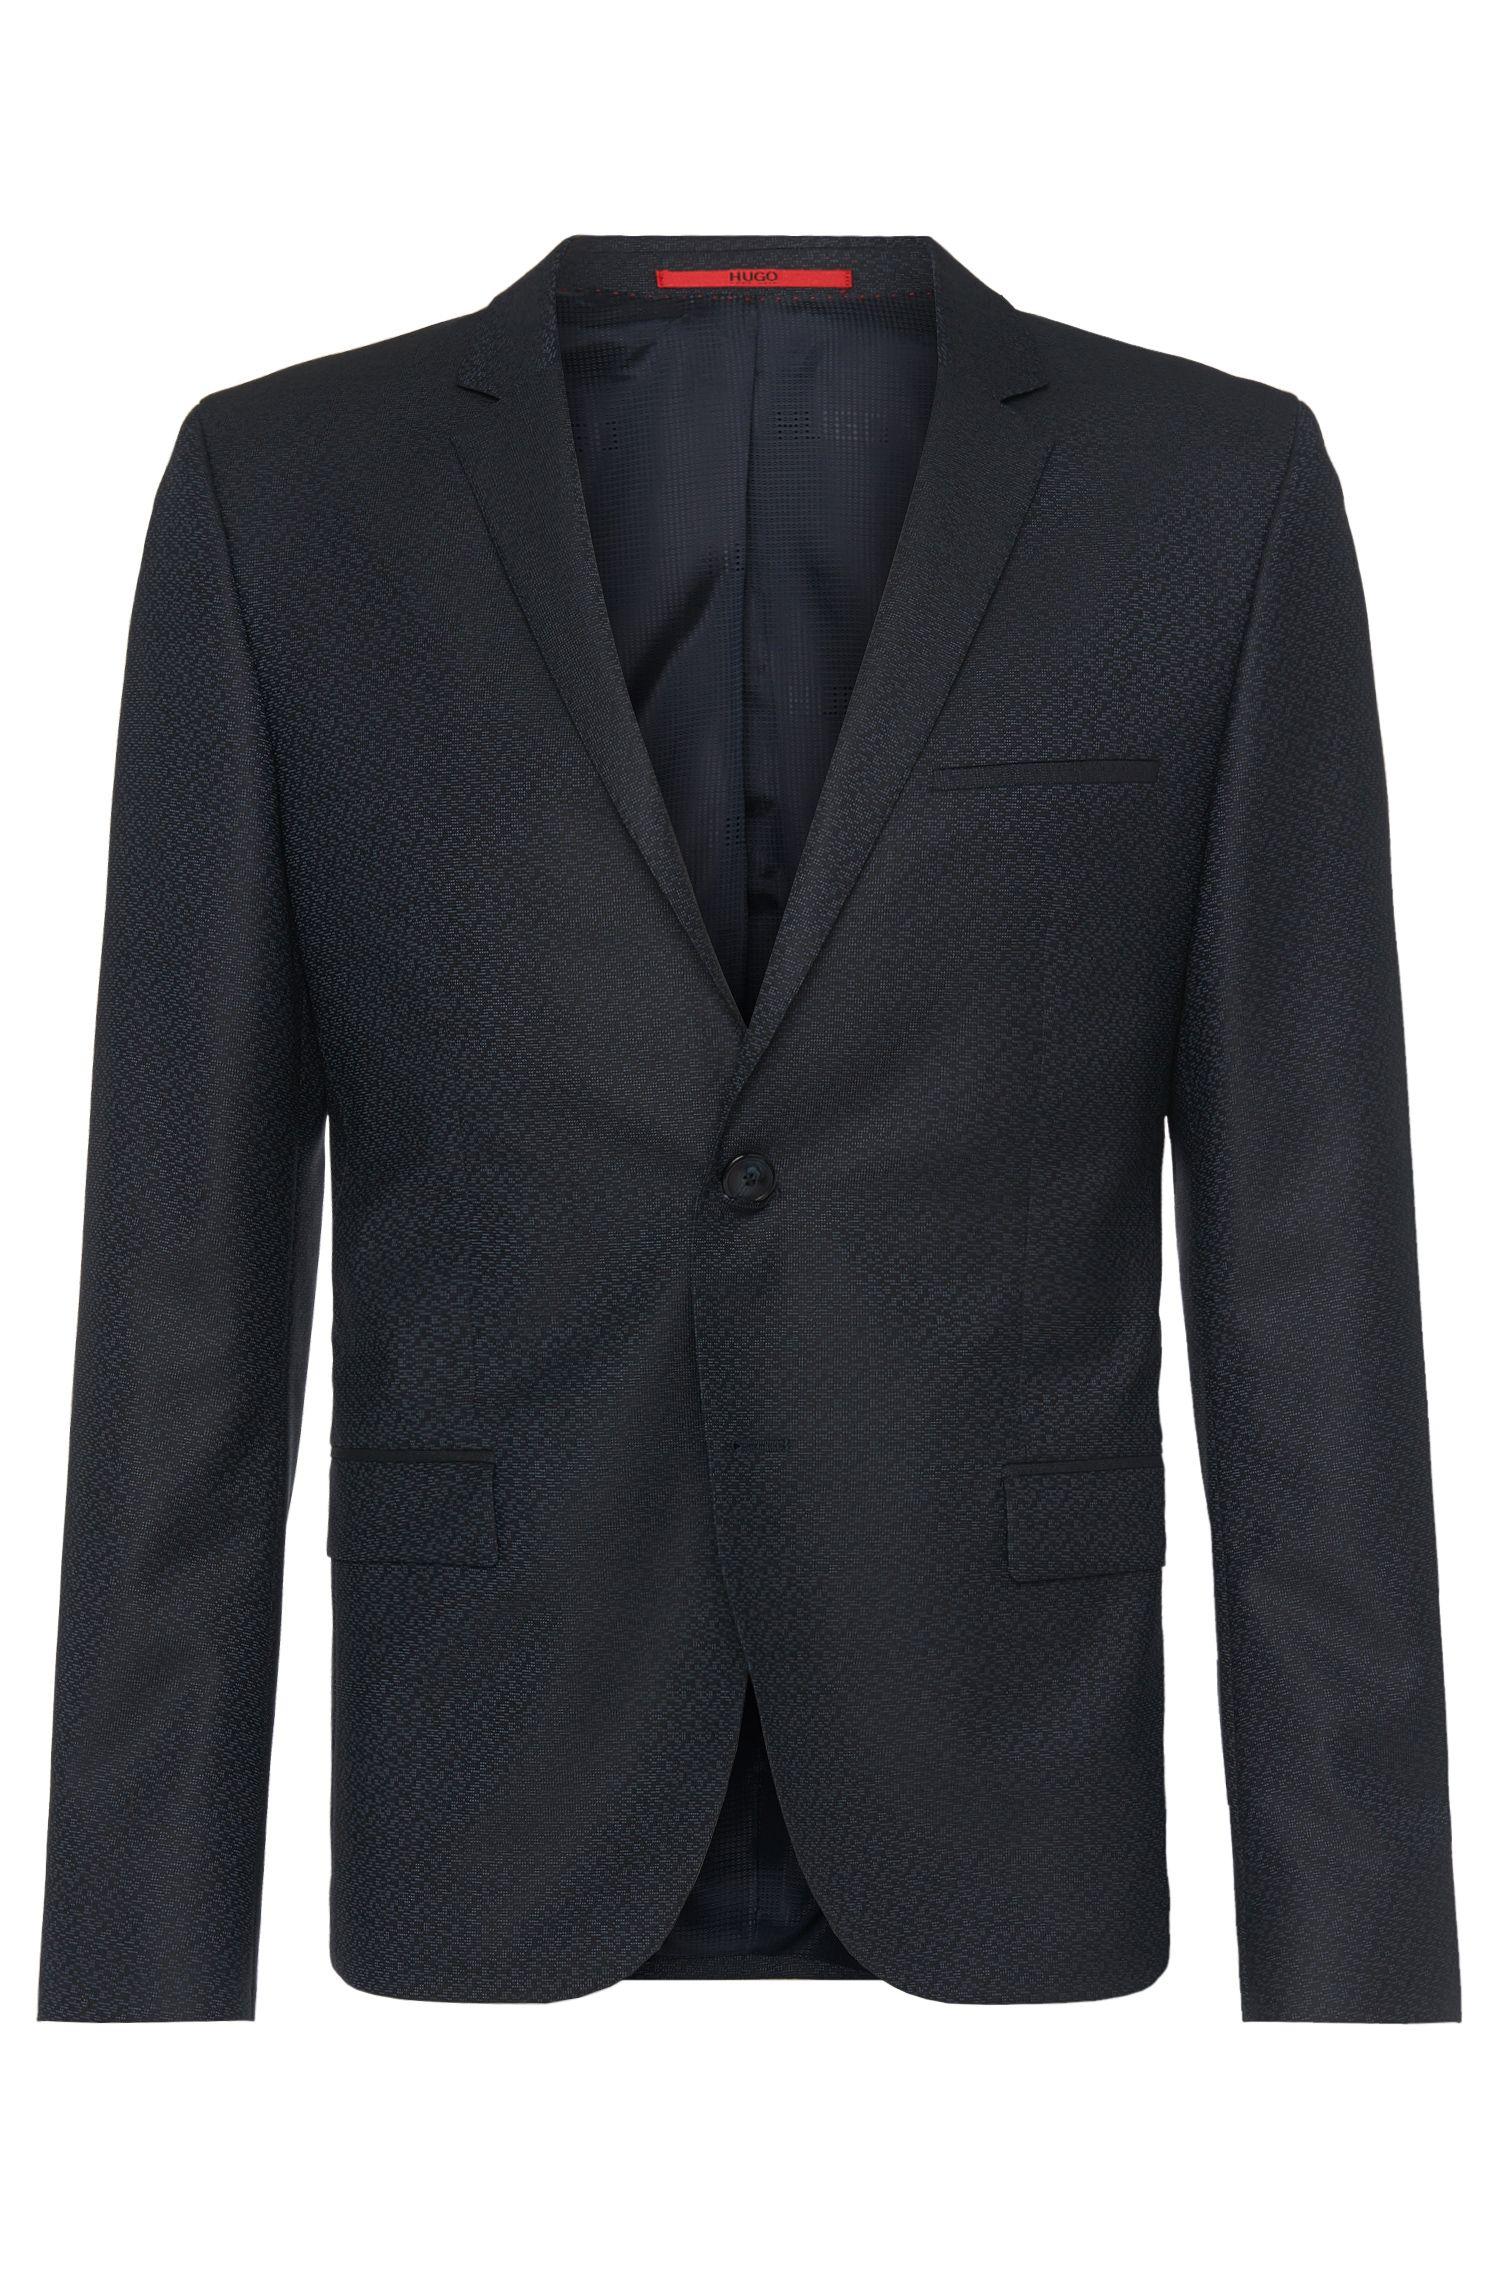 'Arti' | Slim Fit, Stretch Virgin Wool Jacquard Sport Coat